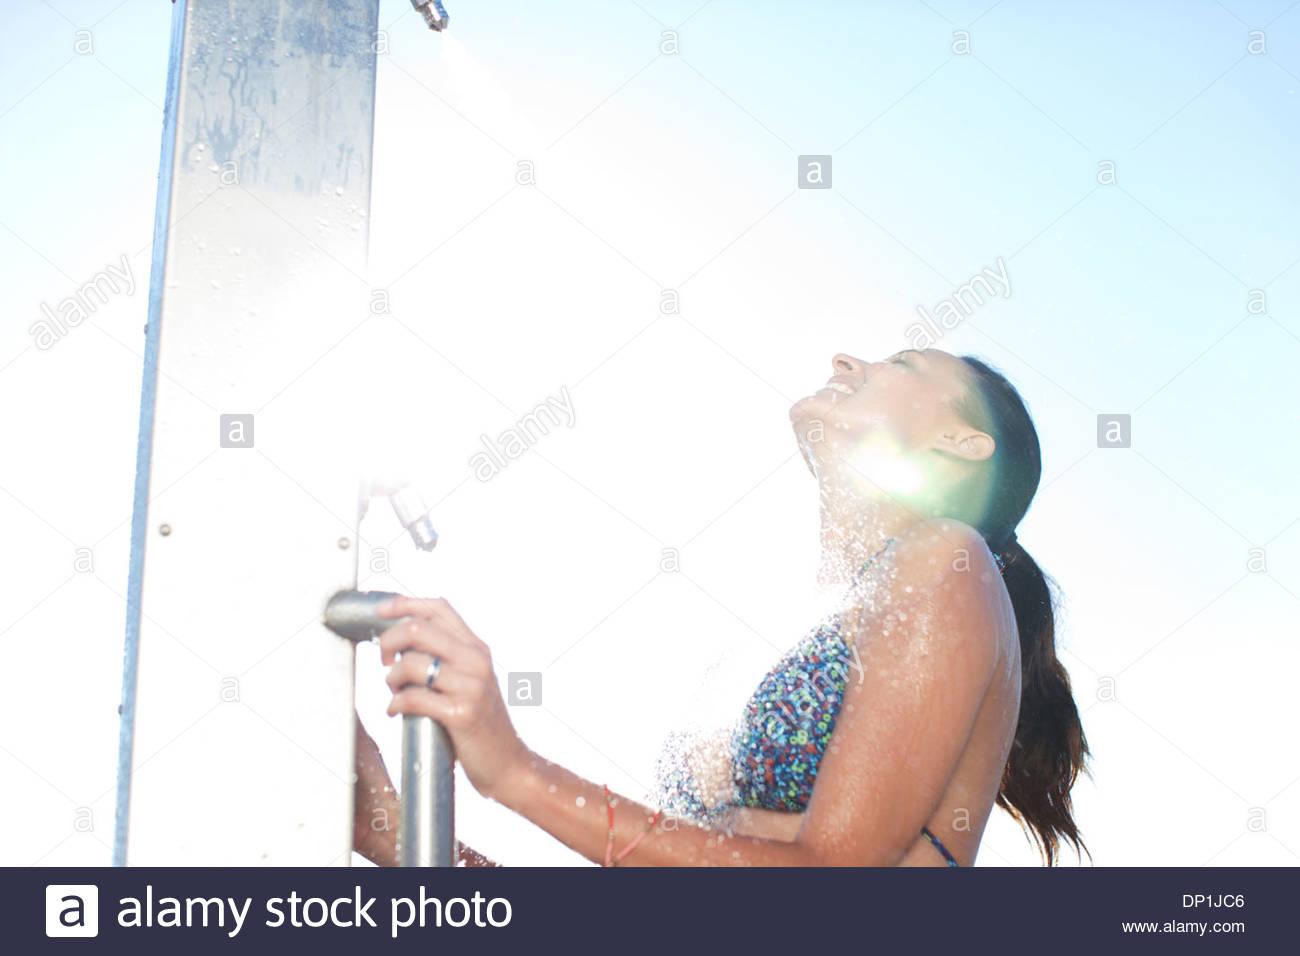 Woman in bikini la douche on beach Photo Stock